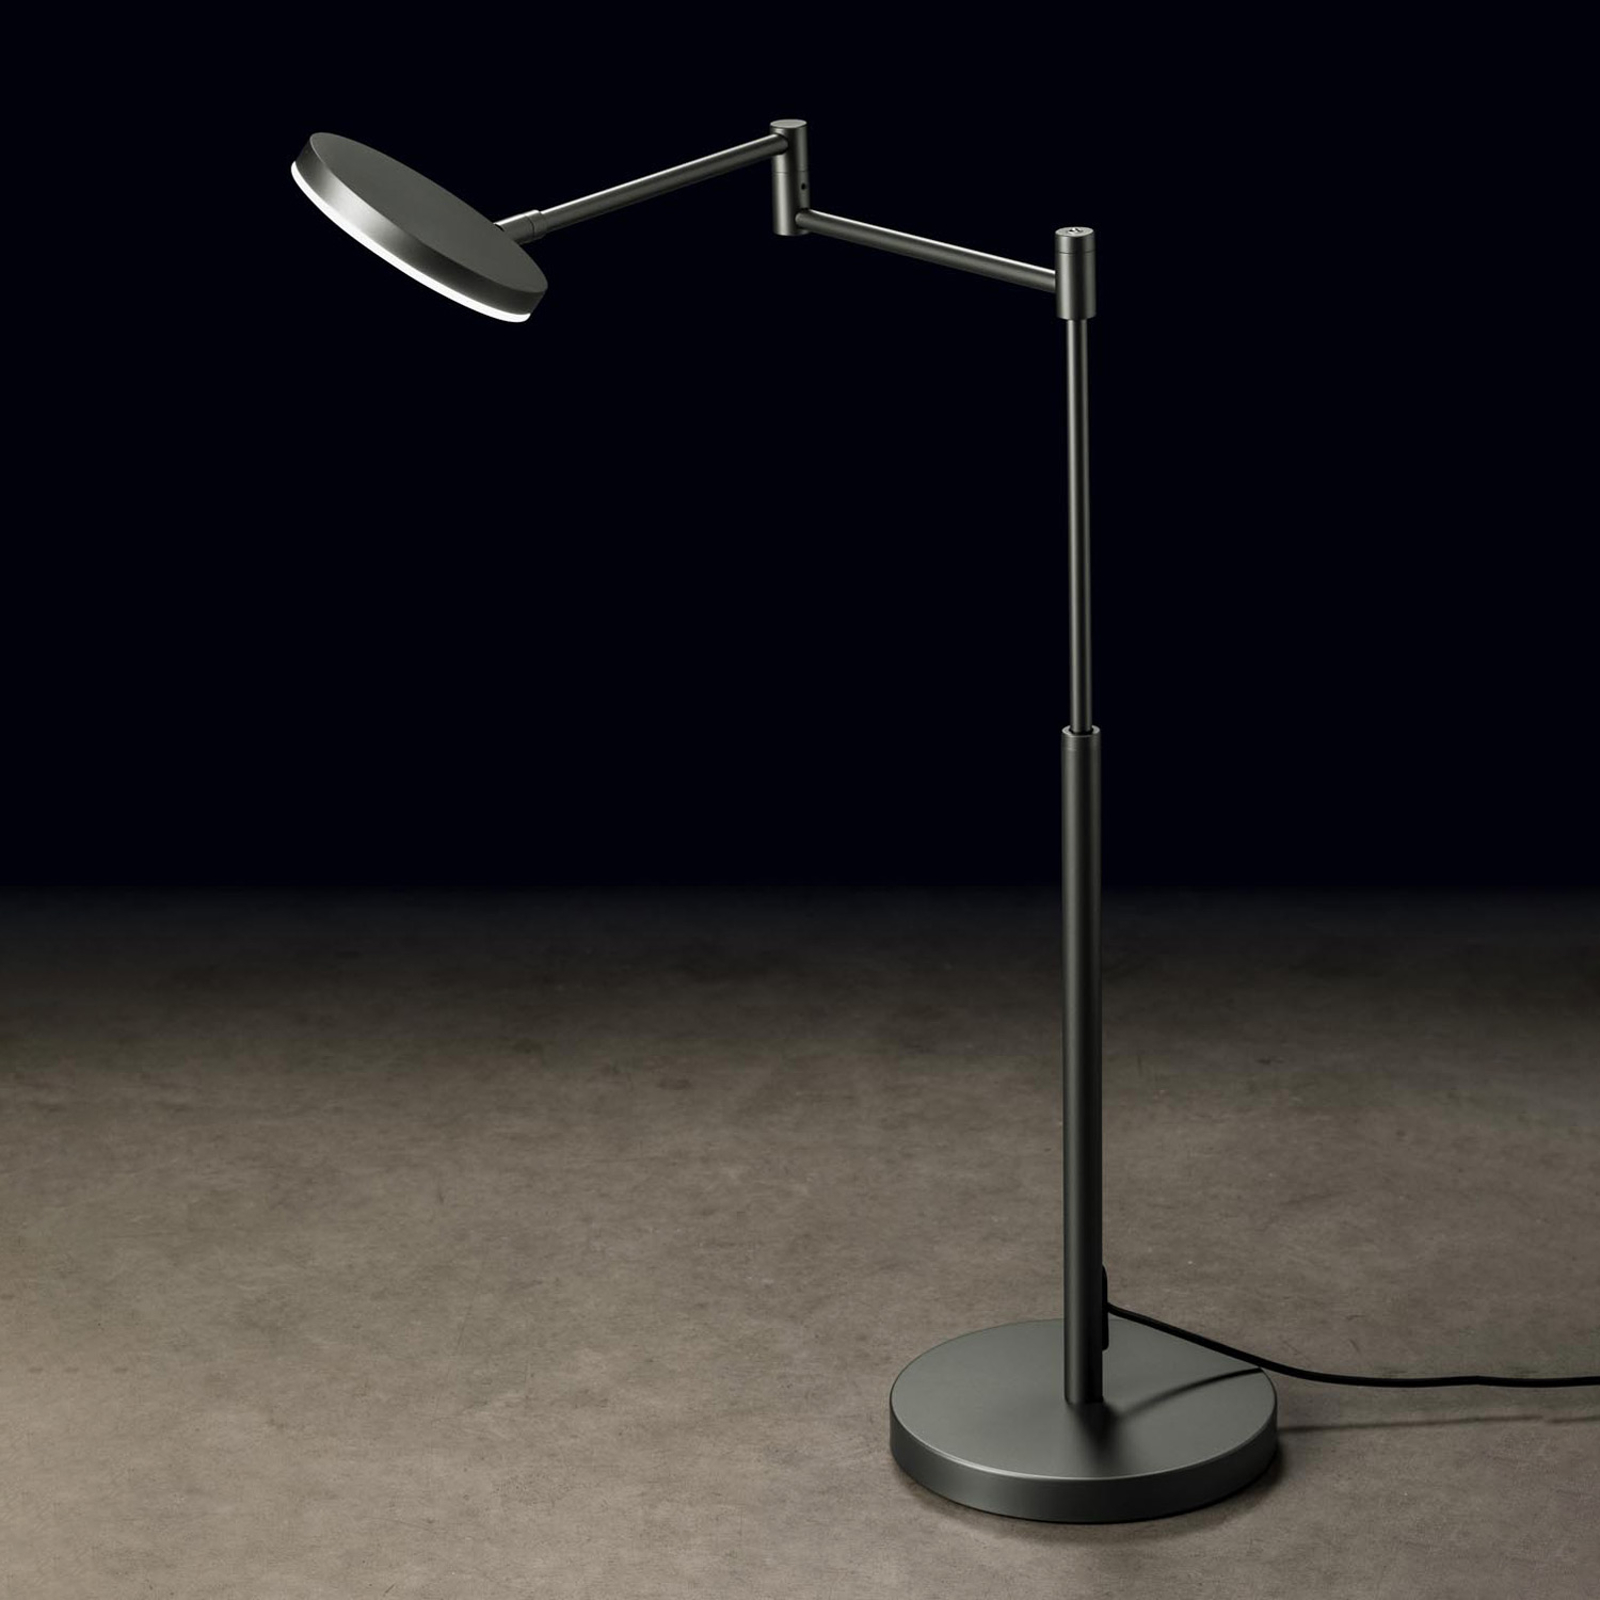 Holtkötter Plano T LED tafellamp platina